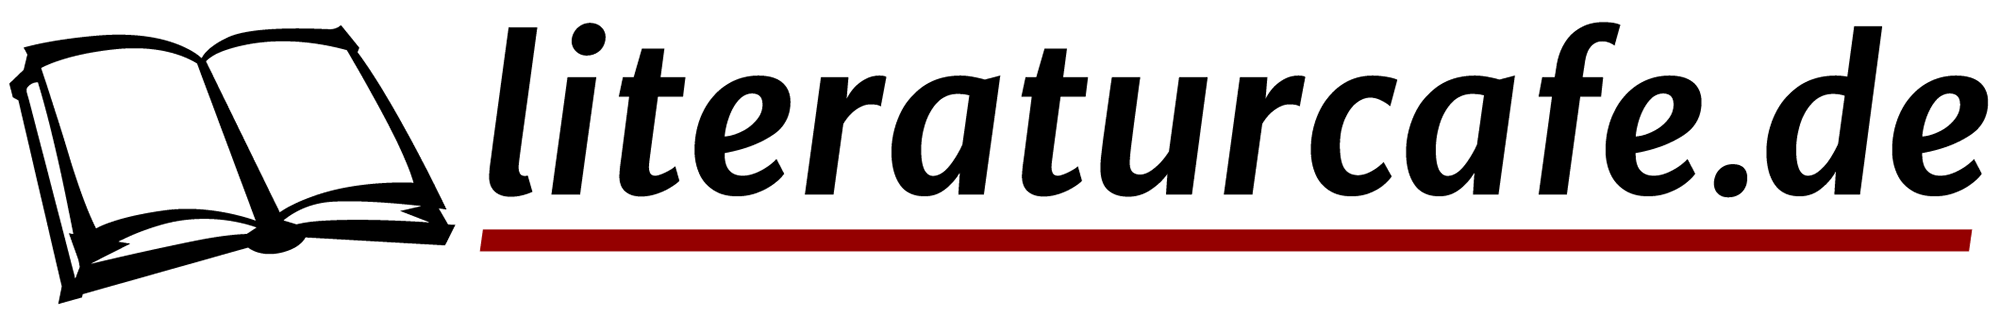 Das Logo des literaturcafe.de